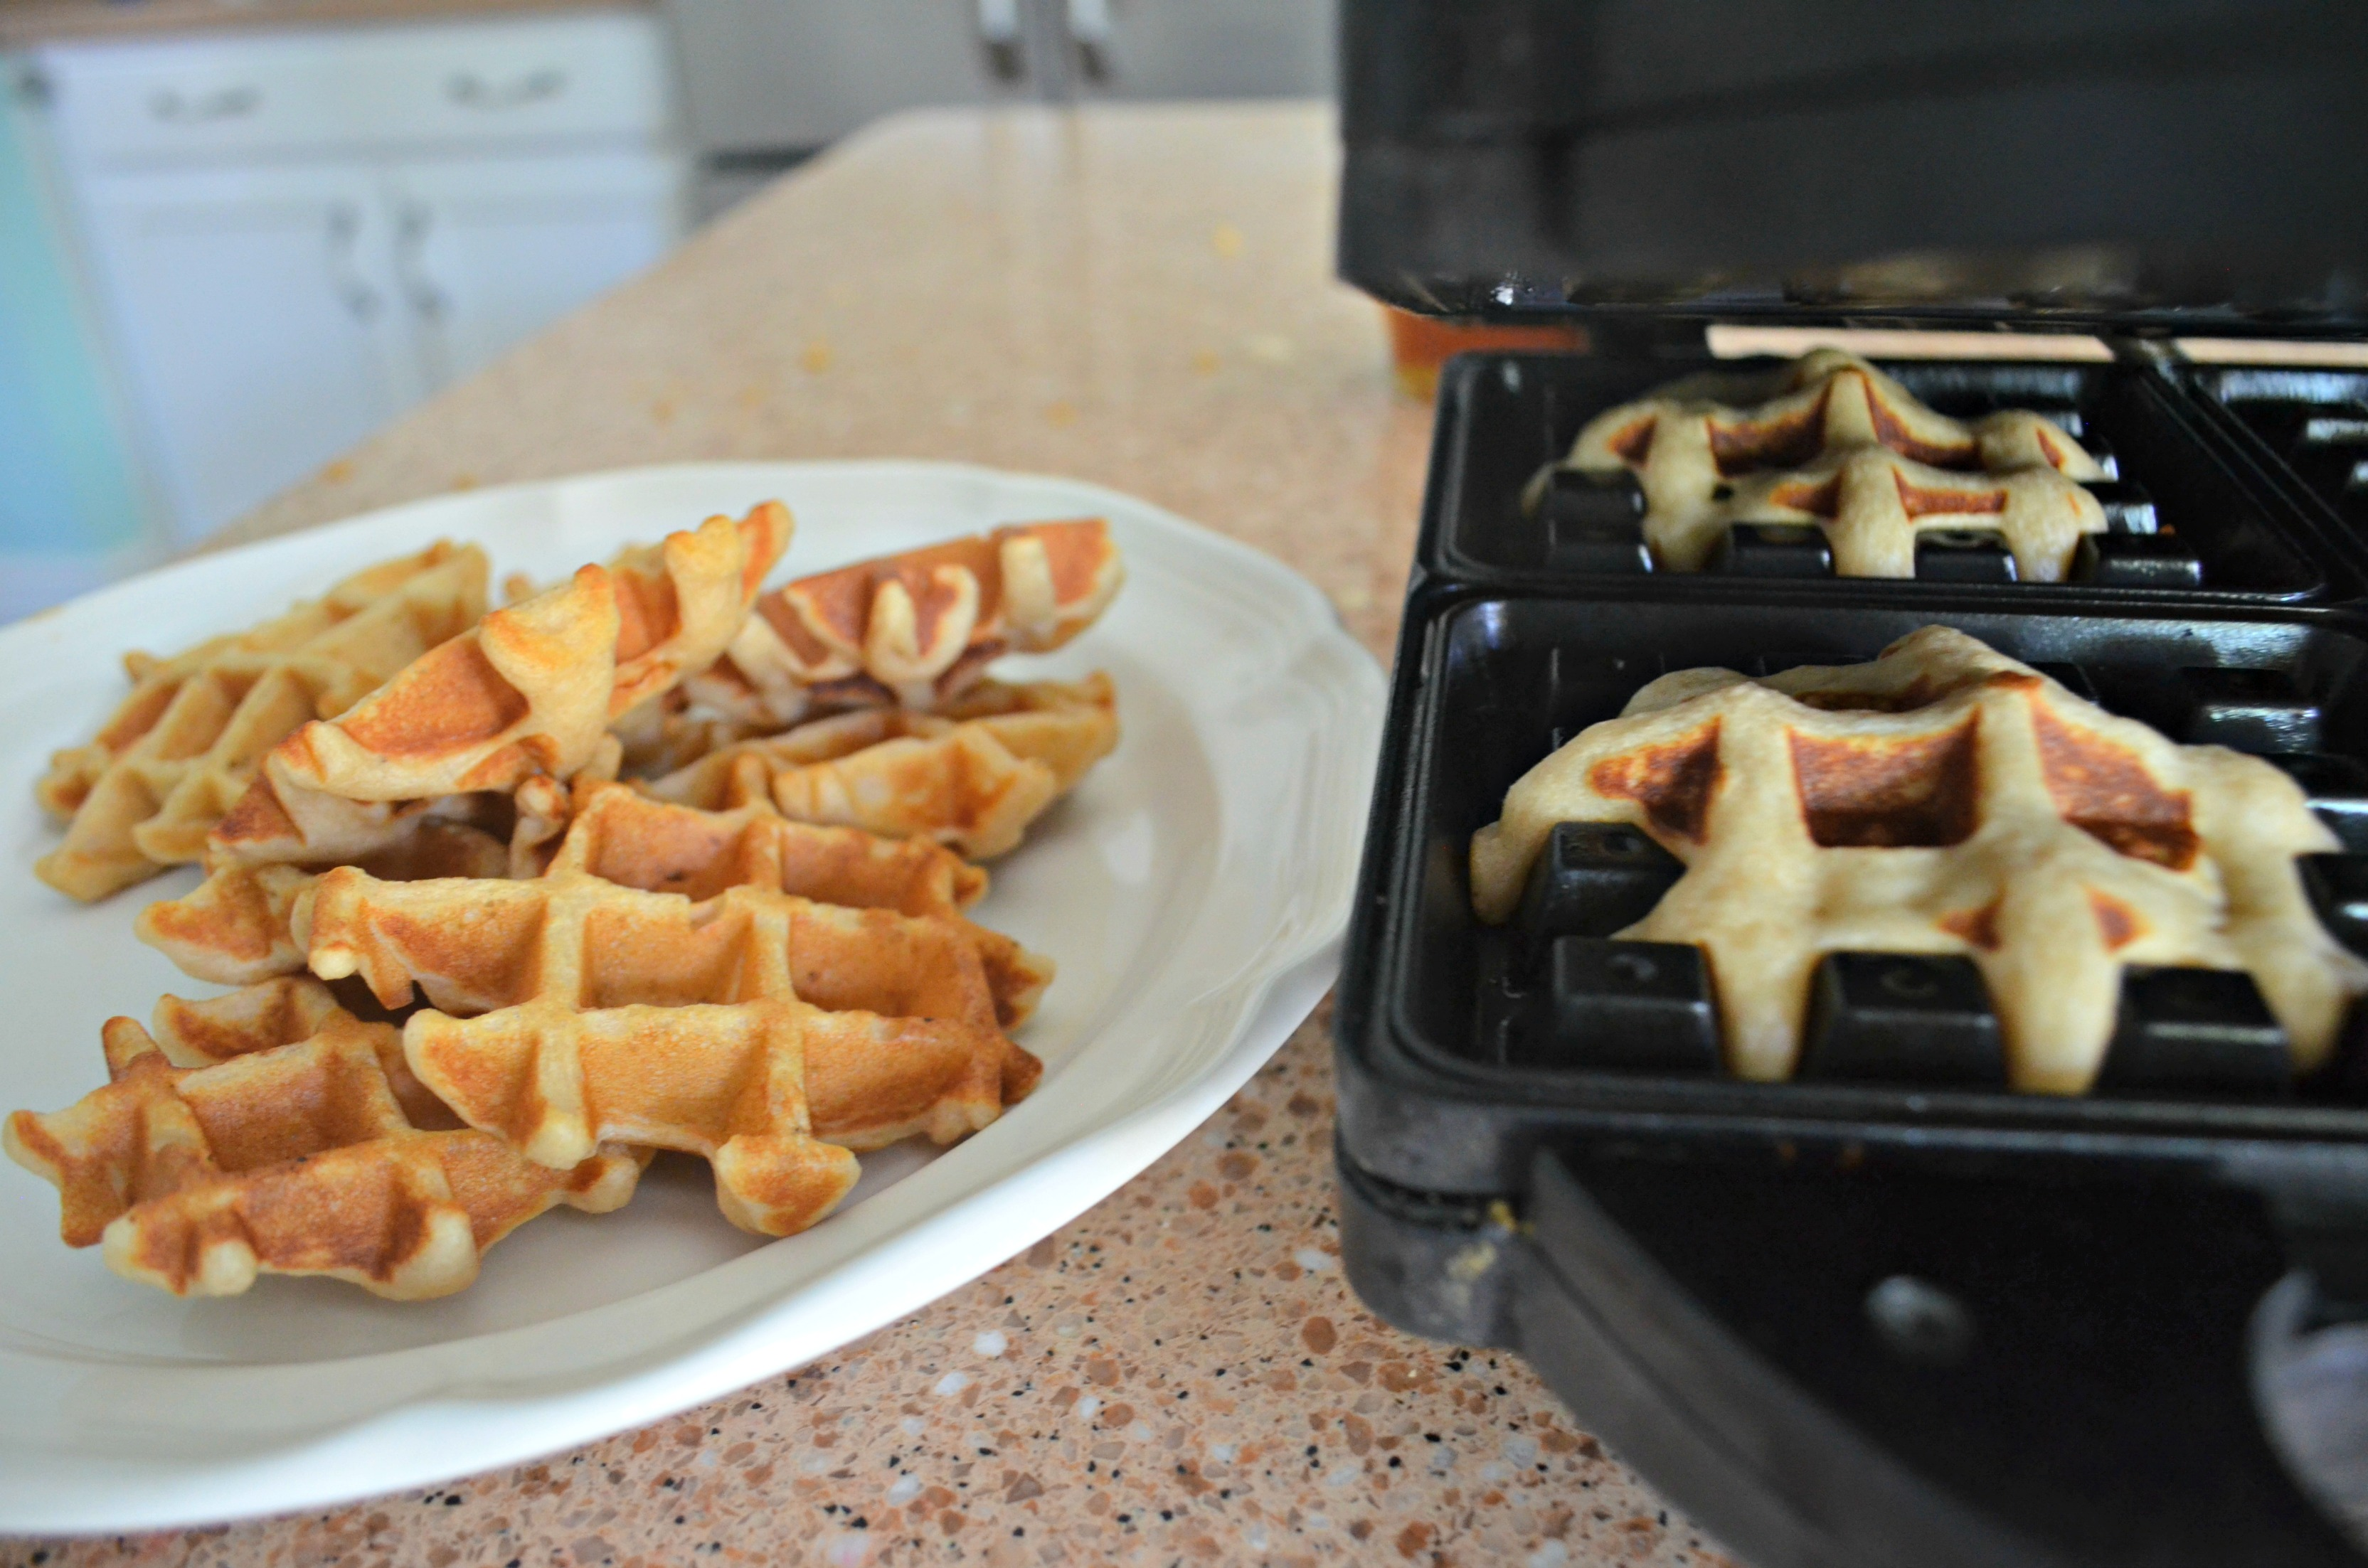 Easy Cornflake Chicken and Mini Waffles - making the mini waffles